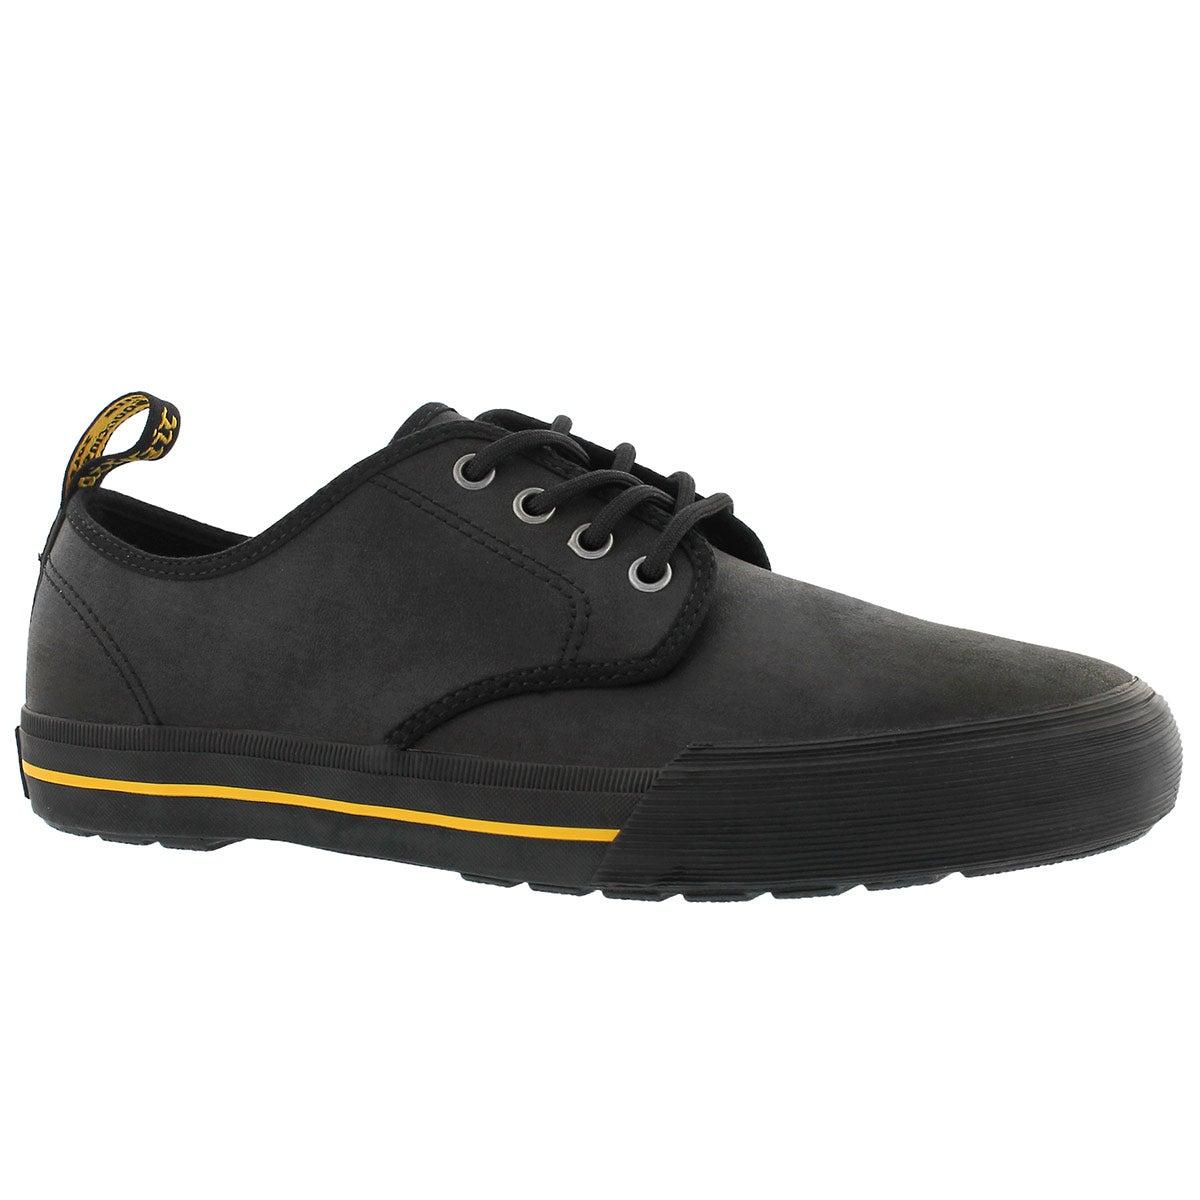 Men's PRESSLER LAMPER black lace up sneakers